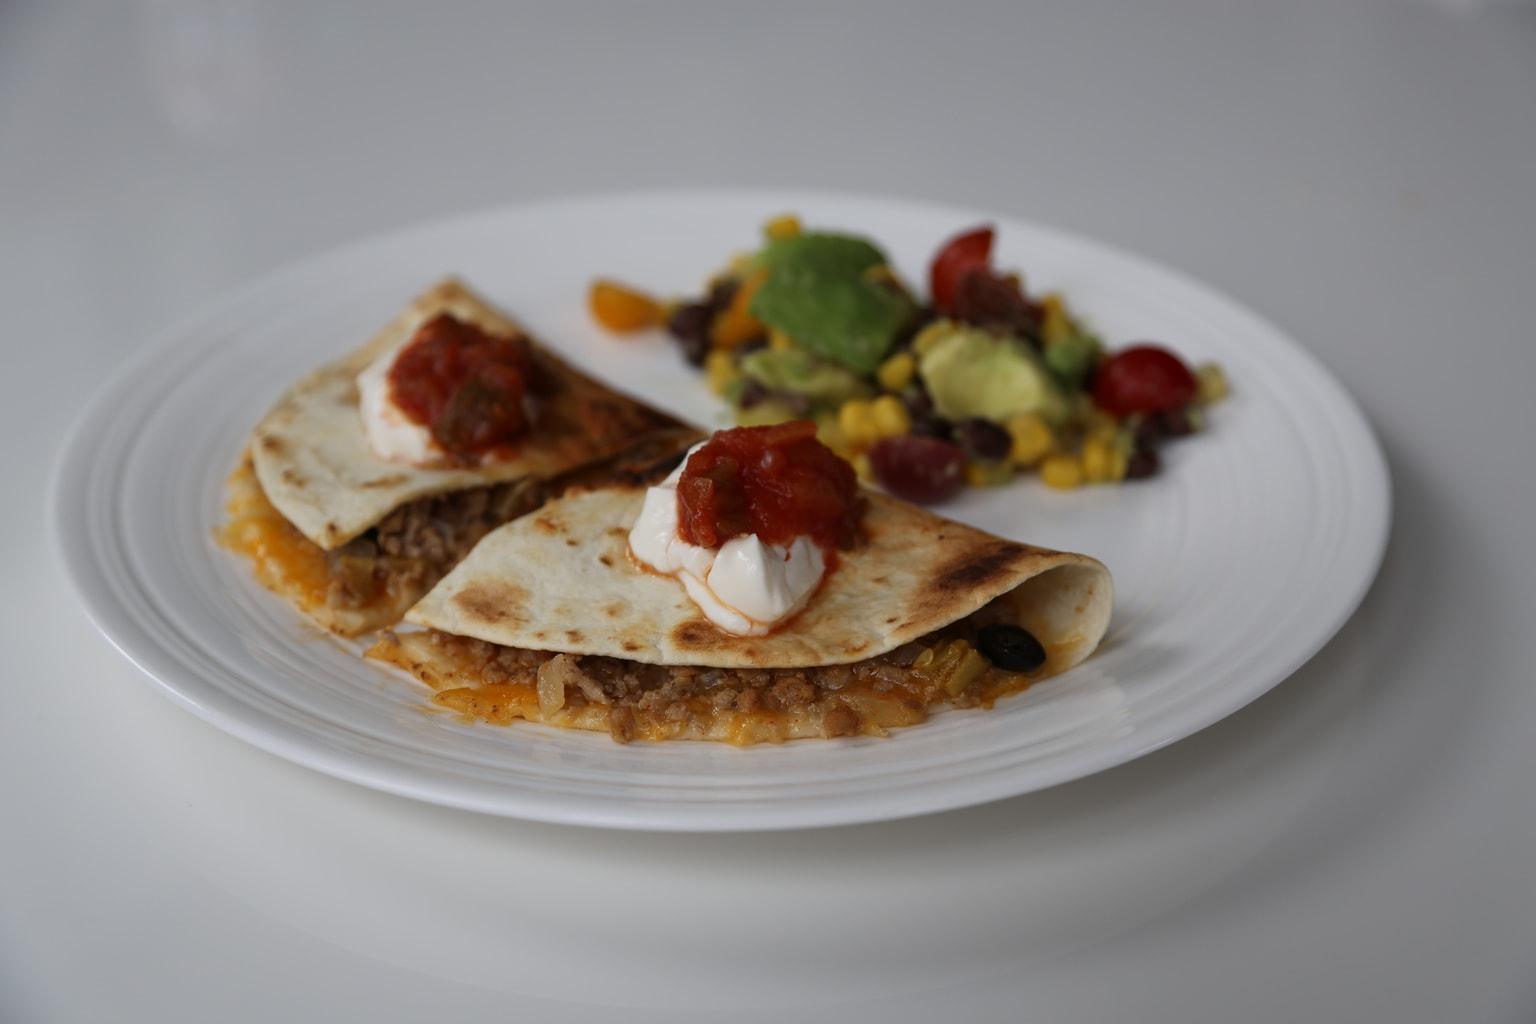 Southwest Quesadillas on plate